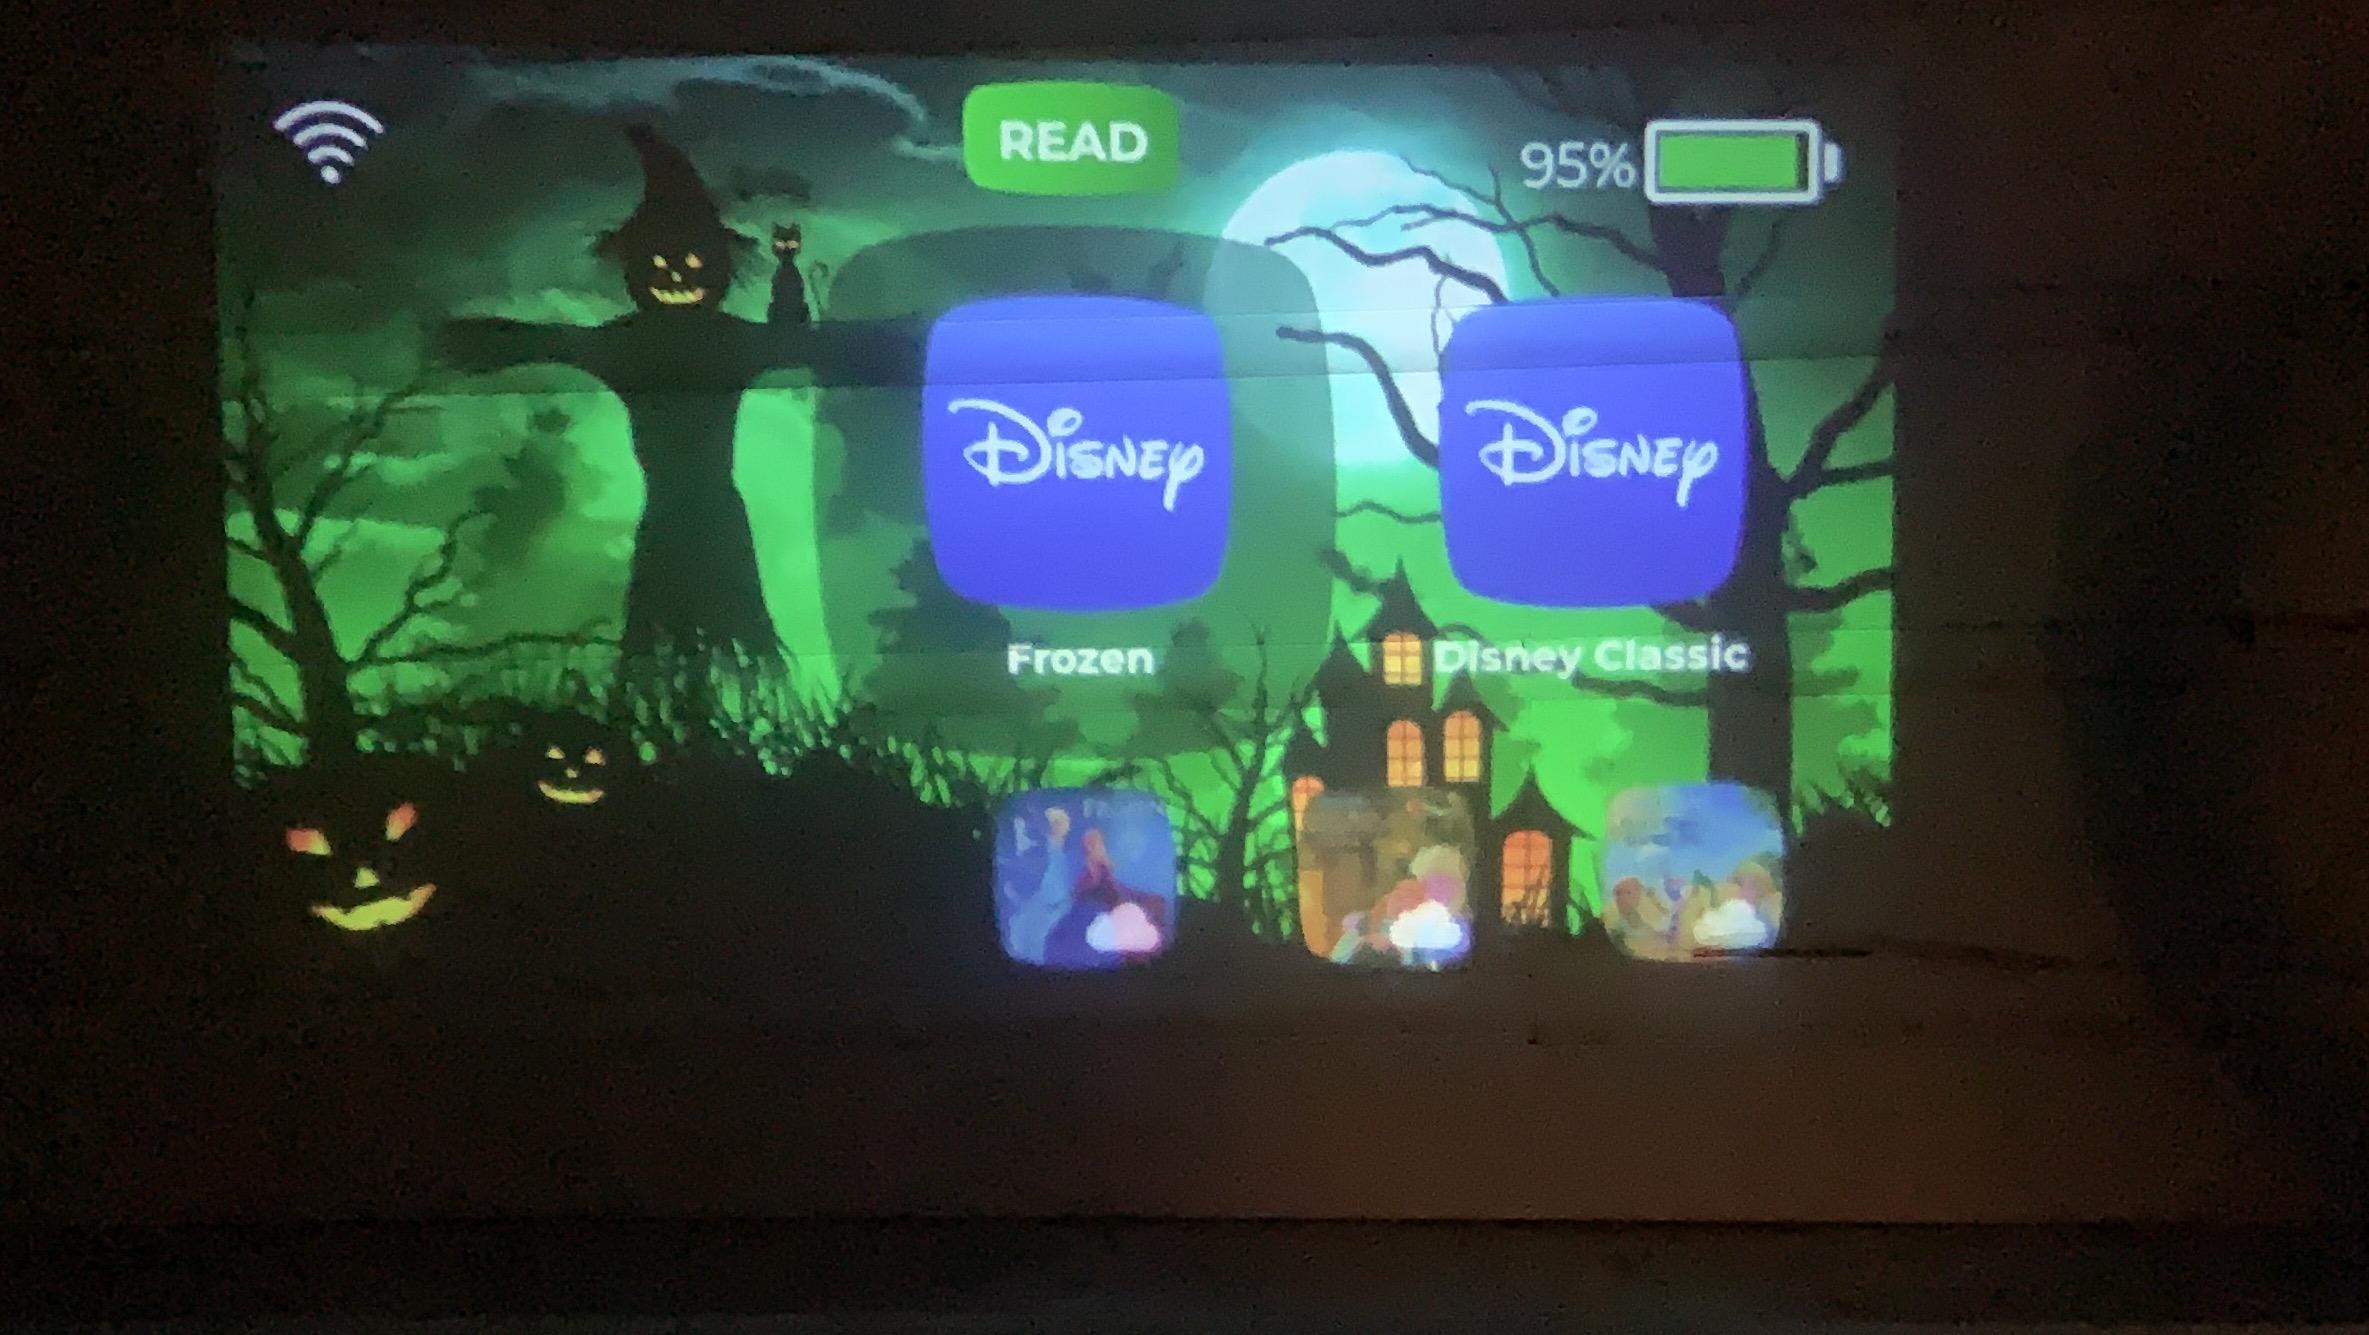 CINEMOOD Disney Content